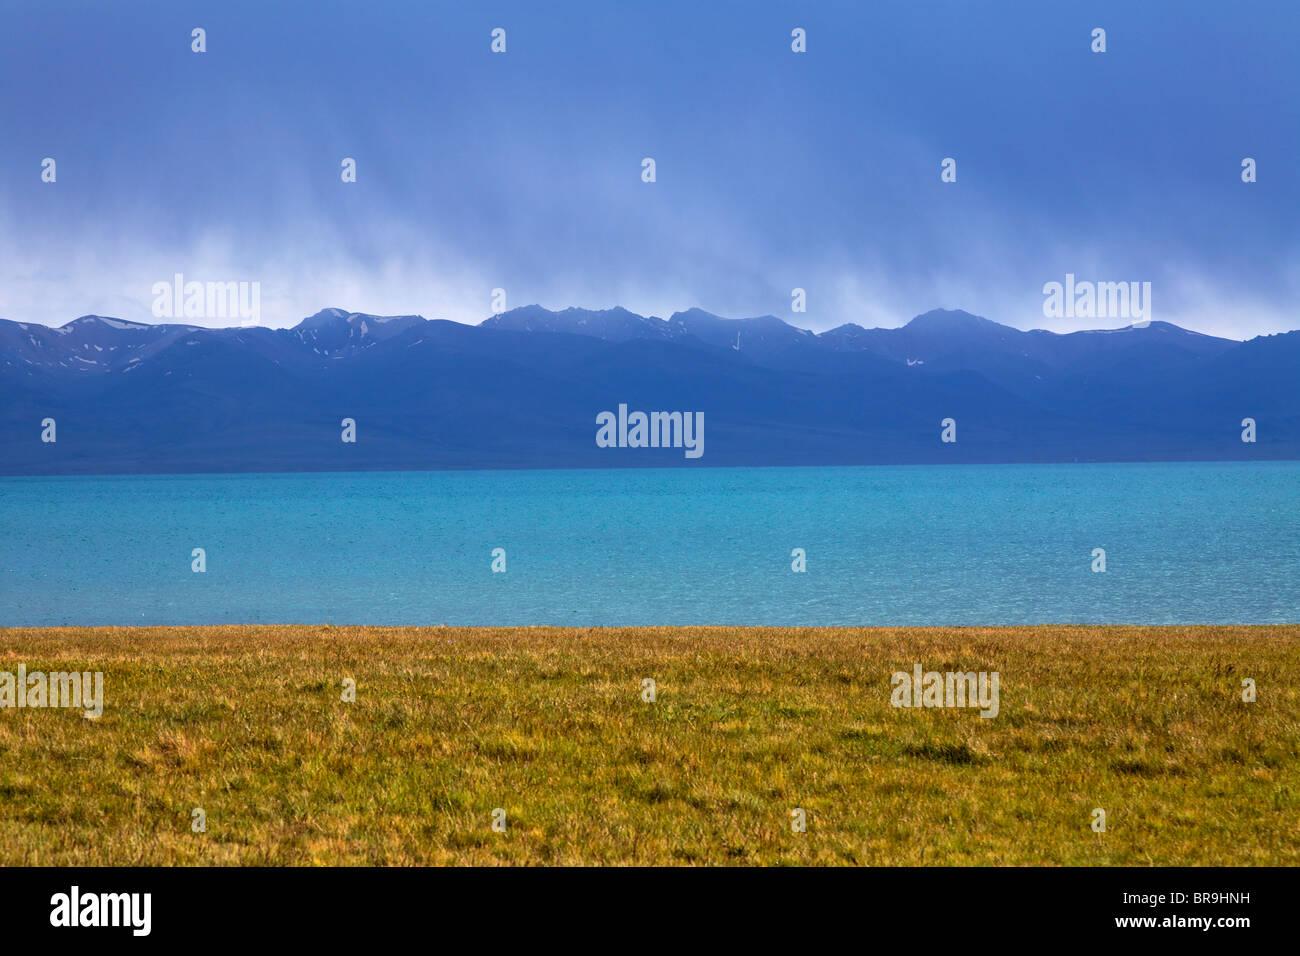 Lake Song Kul, Kyrgyzstan - Stock Image